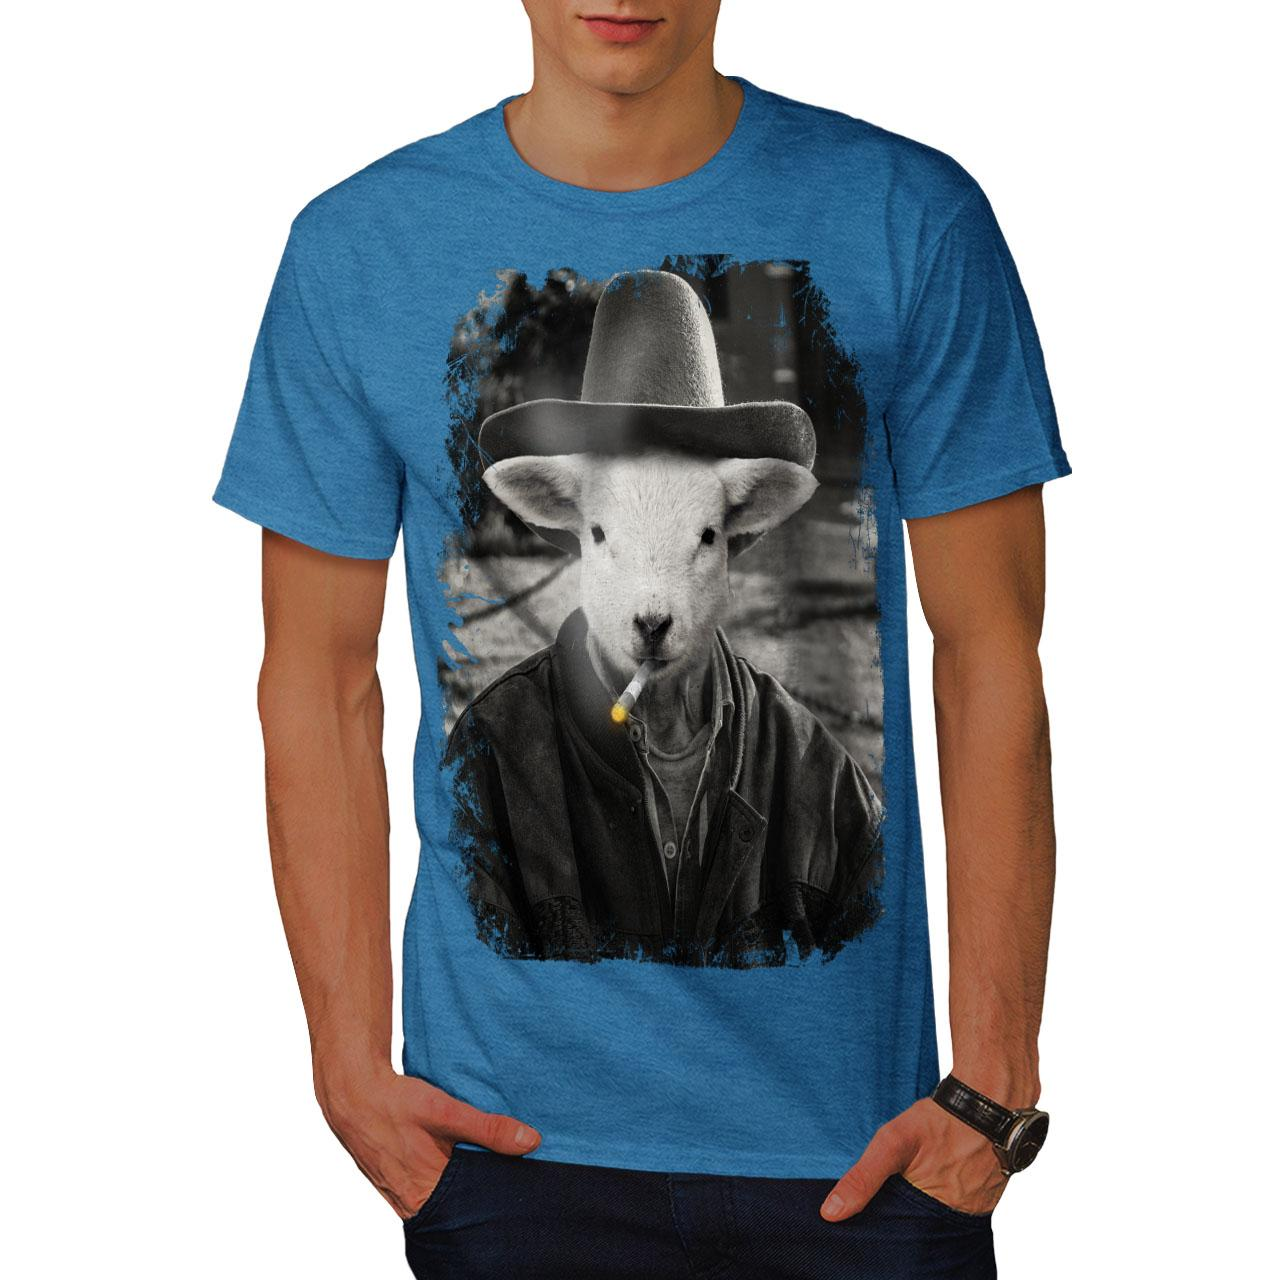 fb11c2a66b3c Cheap Custom Music Shirts Best Dollar Print Shirt